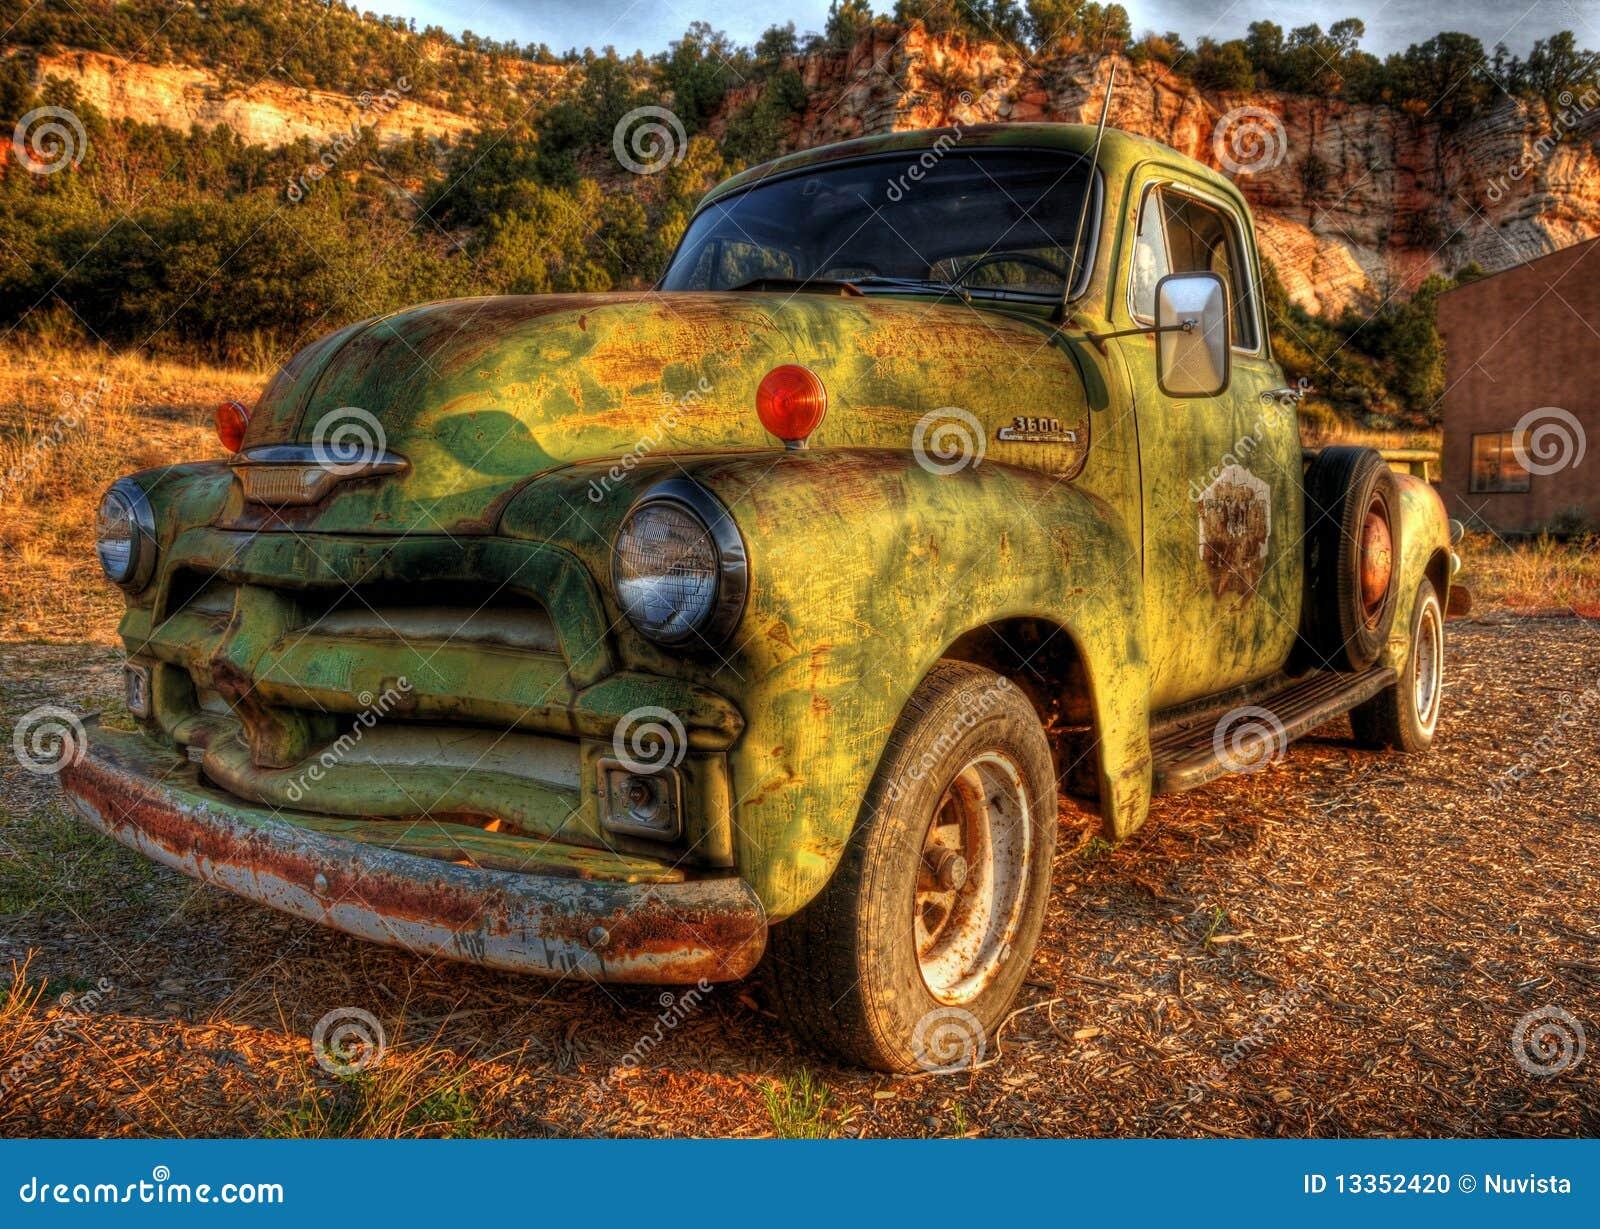 Vintage Pick Up Truck Stock Photo - Image: 13352420